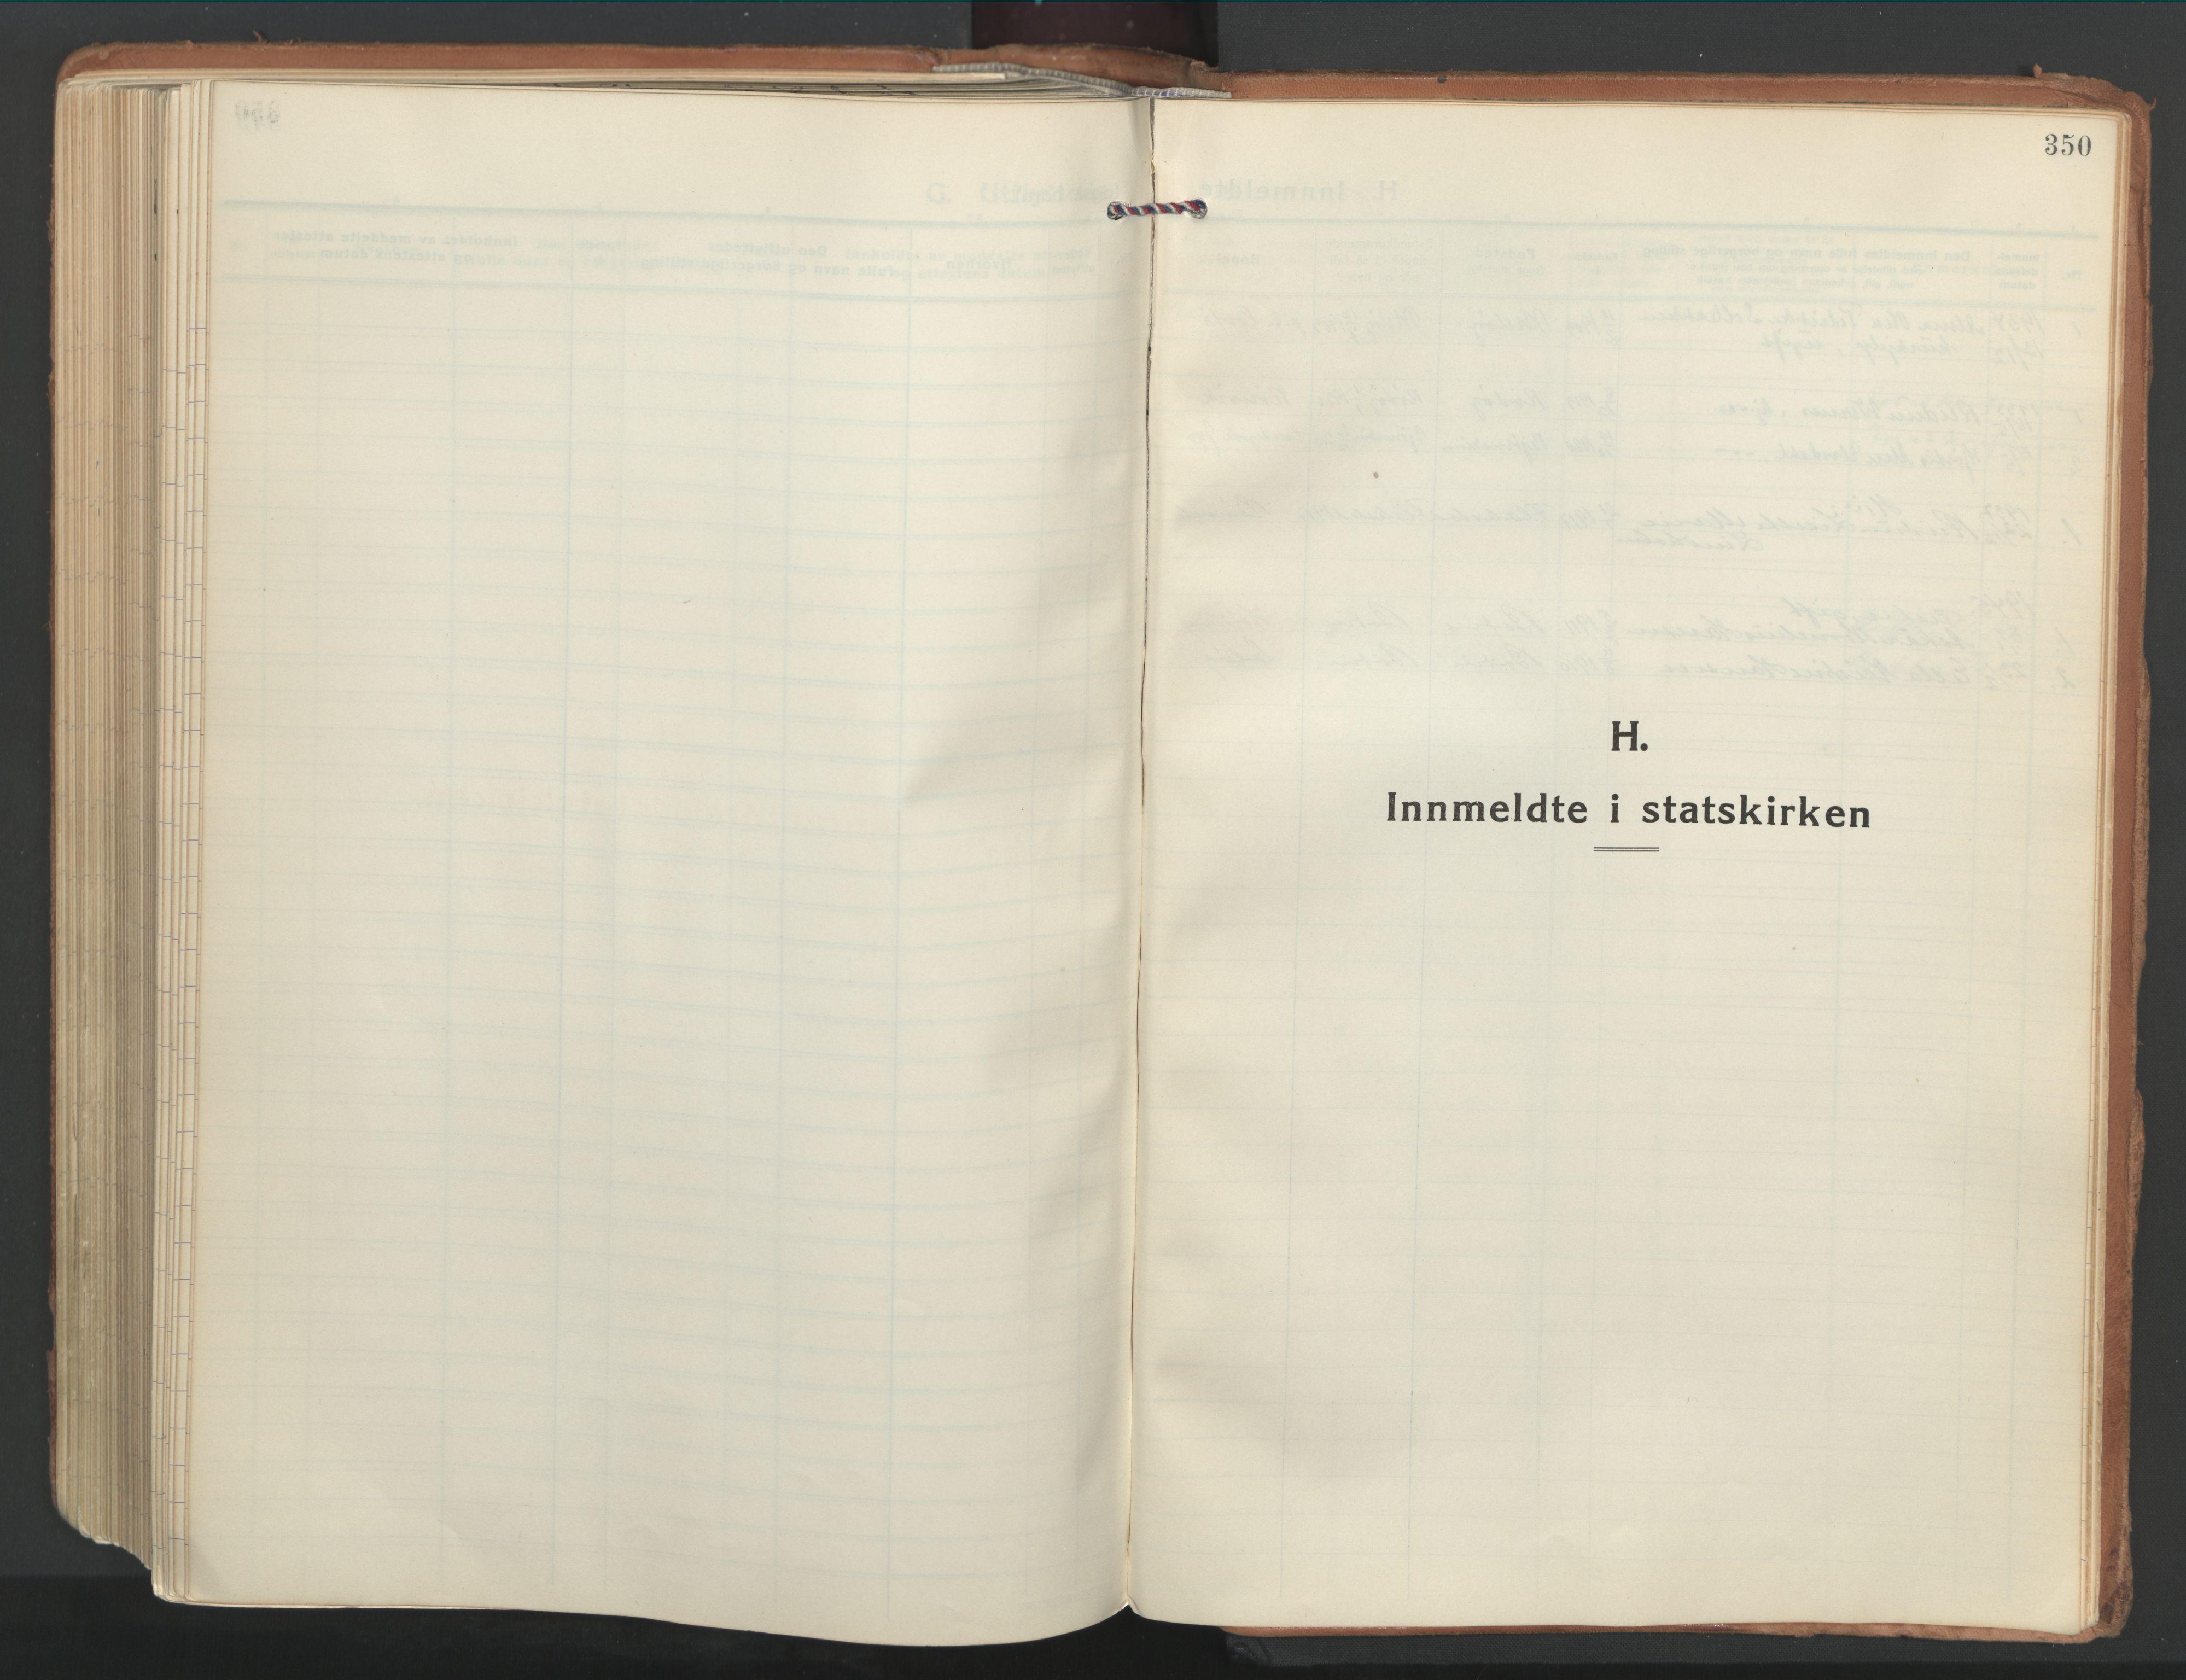 SAT, Ministerialprotokoller, klokkerbøker og fødselsregistre - Nordland, 802/L0061: Ministerialbok nr. 802A08, 1933-1946, s. 346